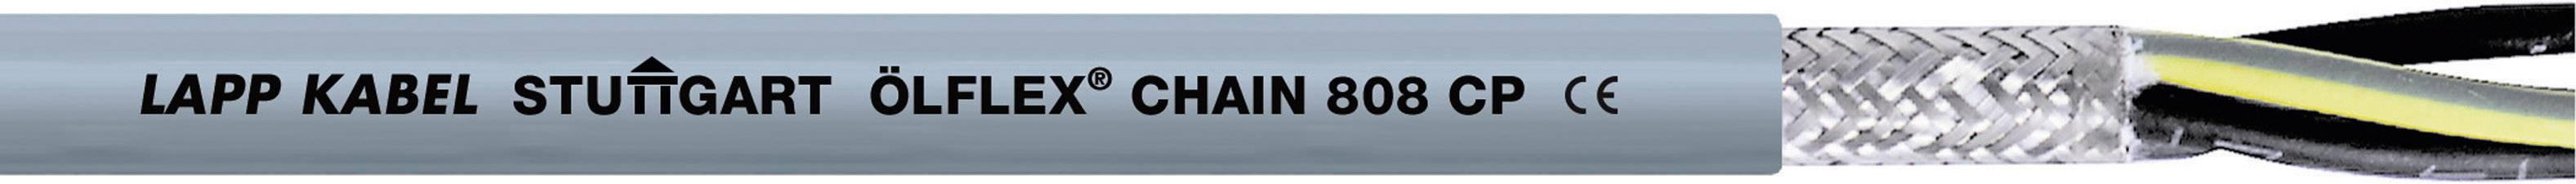 Žíla kabelu LappKabel ÖLFLEX CHAIN 808 CP 7G2,5 (1027785), 7x 2,5 mm², polyurethan, Ø 13,5 mm, stíněný, 50 m,